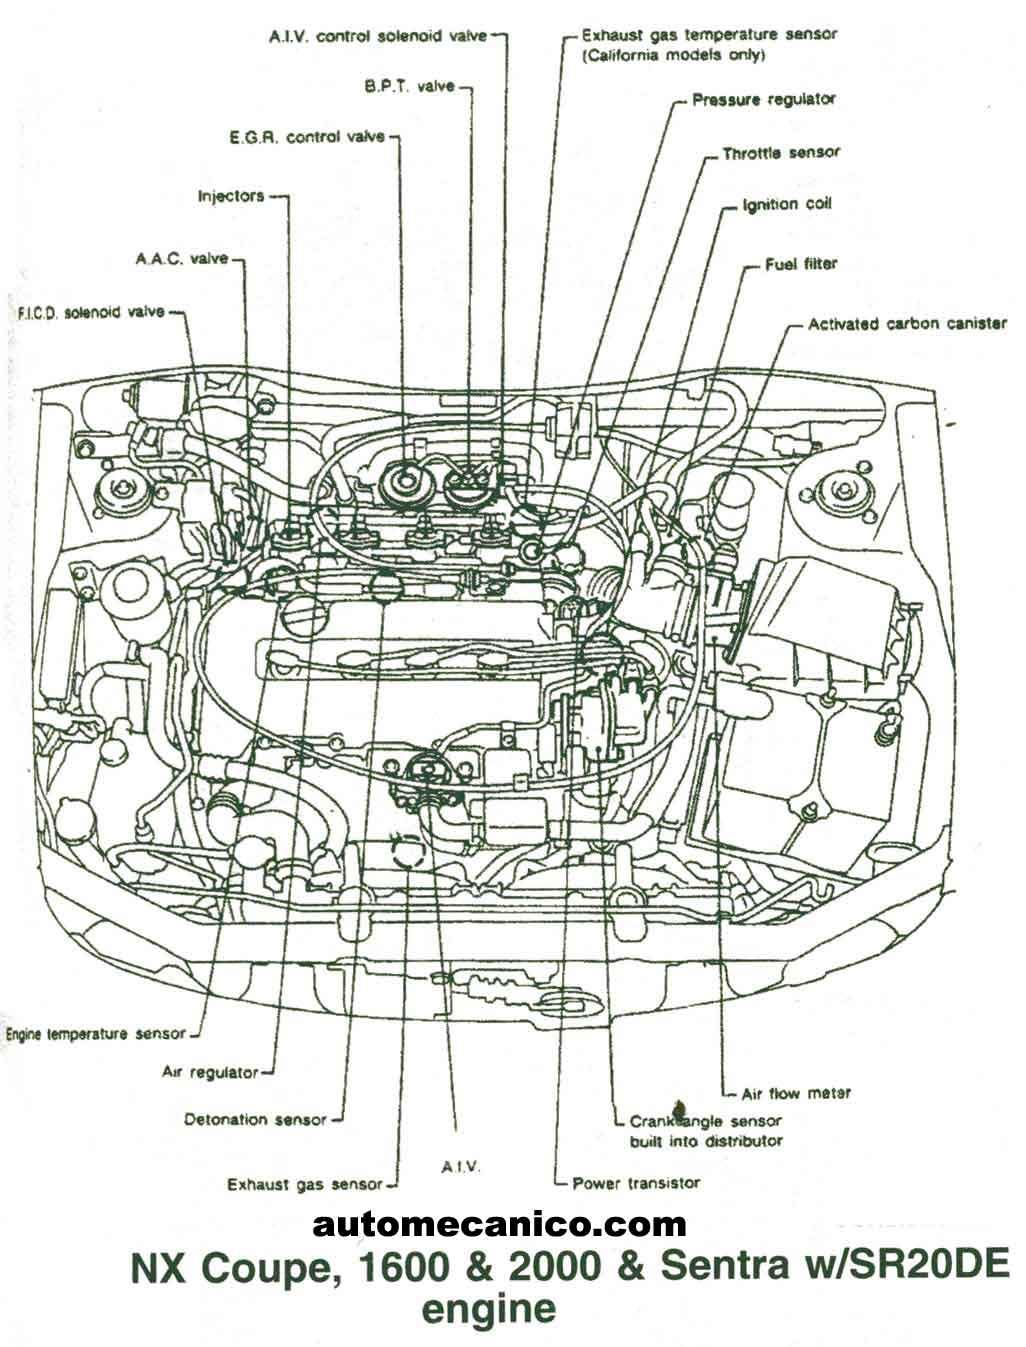 2005 Nissan Altima Maf Wiring Diagram Nissan Ubicacion De Sensores Y Componentes Light